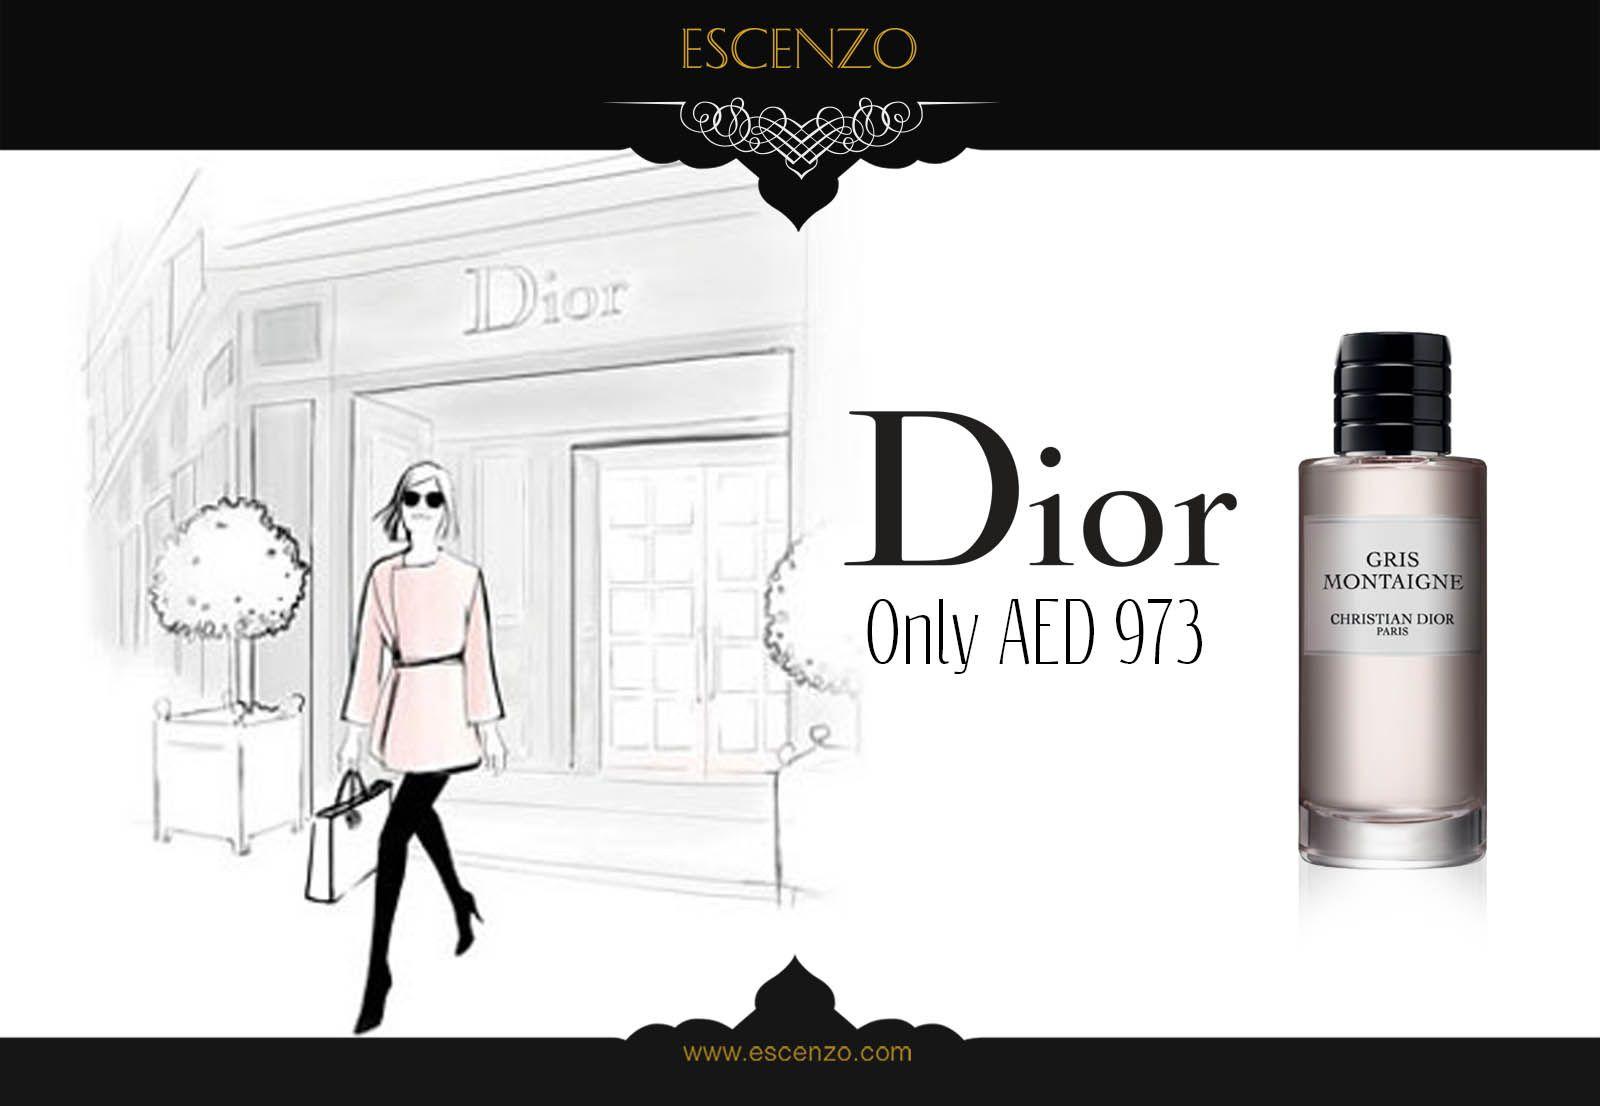 Gris Montaigne Christian Dior gris montaignedior is a chypre floral fragrance for